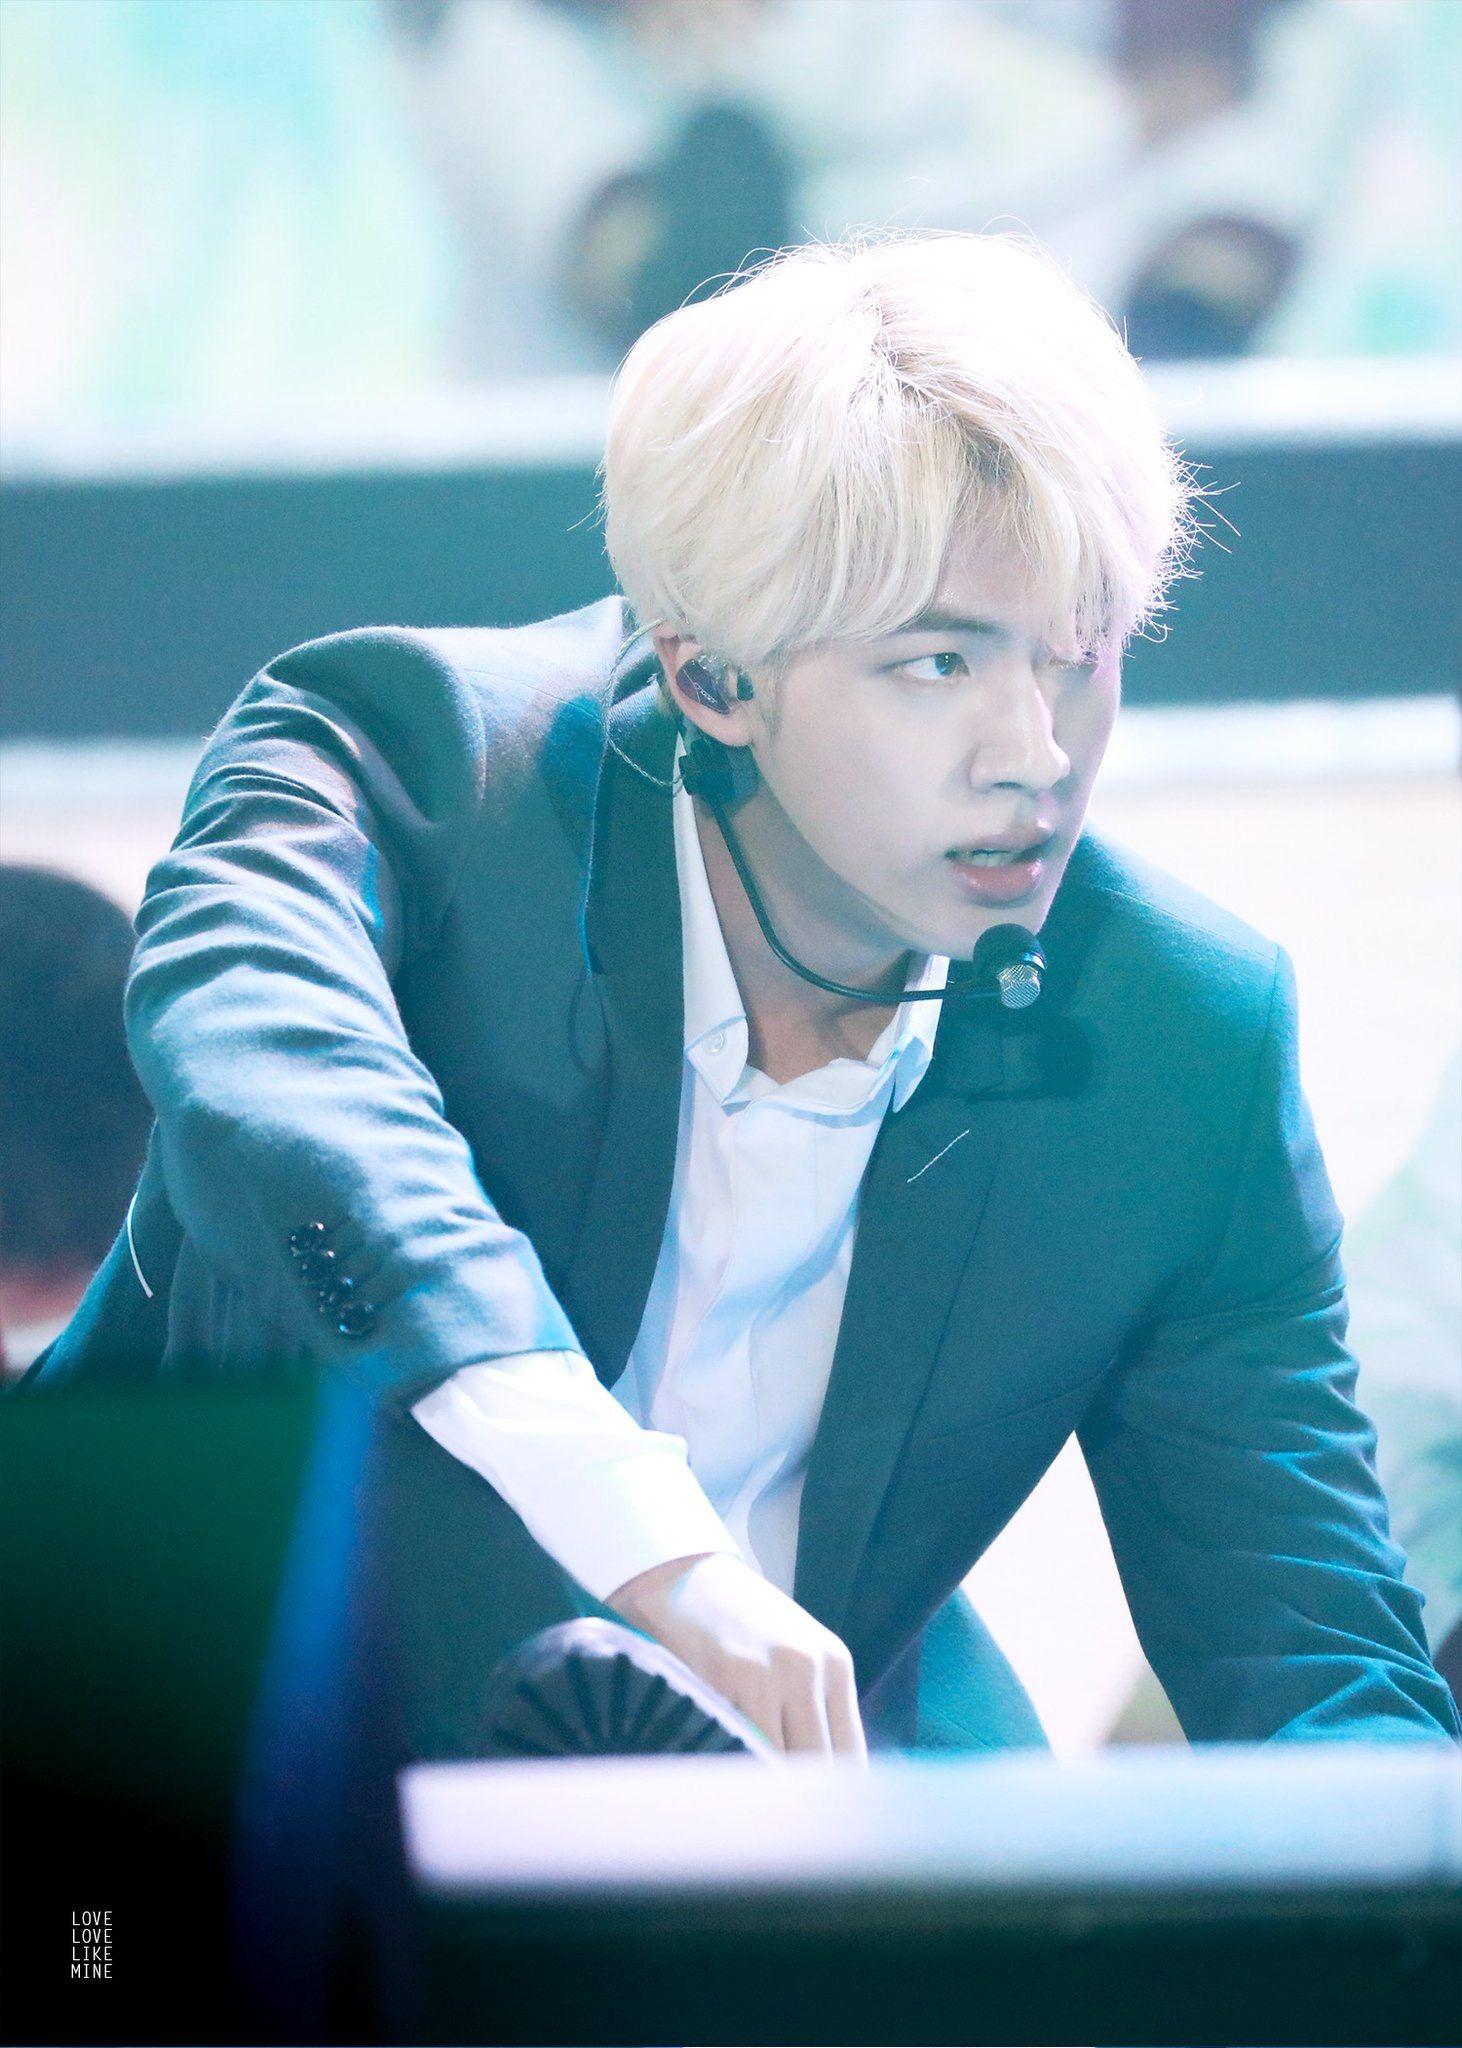 "Bts Kim Seokjin Bts Bangtan Ë°©íƒ""소년단 Kimseokjin Seokjin Cute Beautiful Beauty Handsome Kpop Performance Bts Jin Seokjin Kim Seokjin"